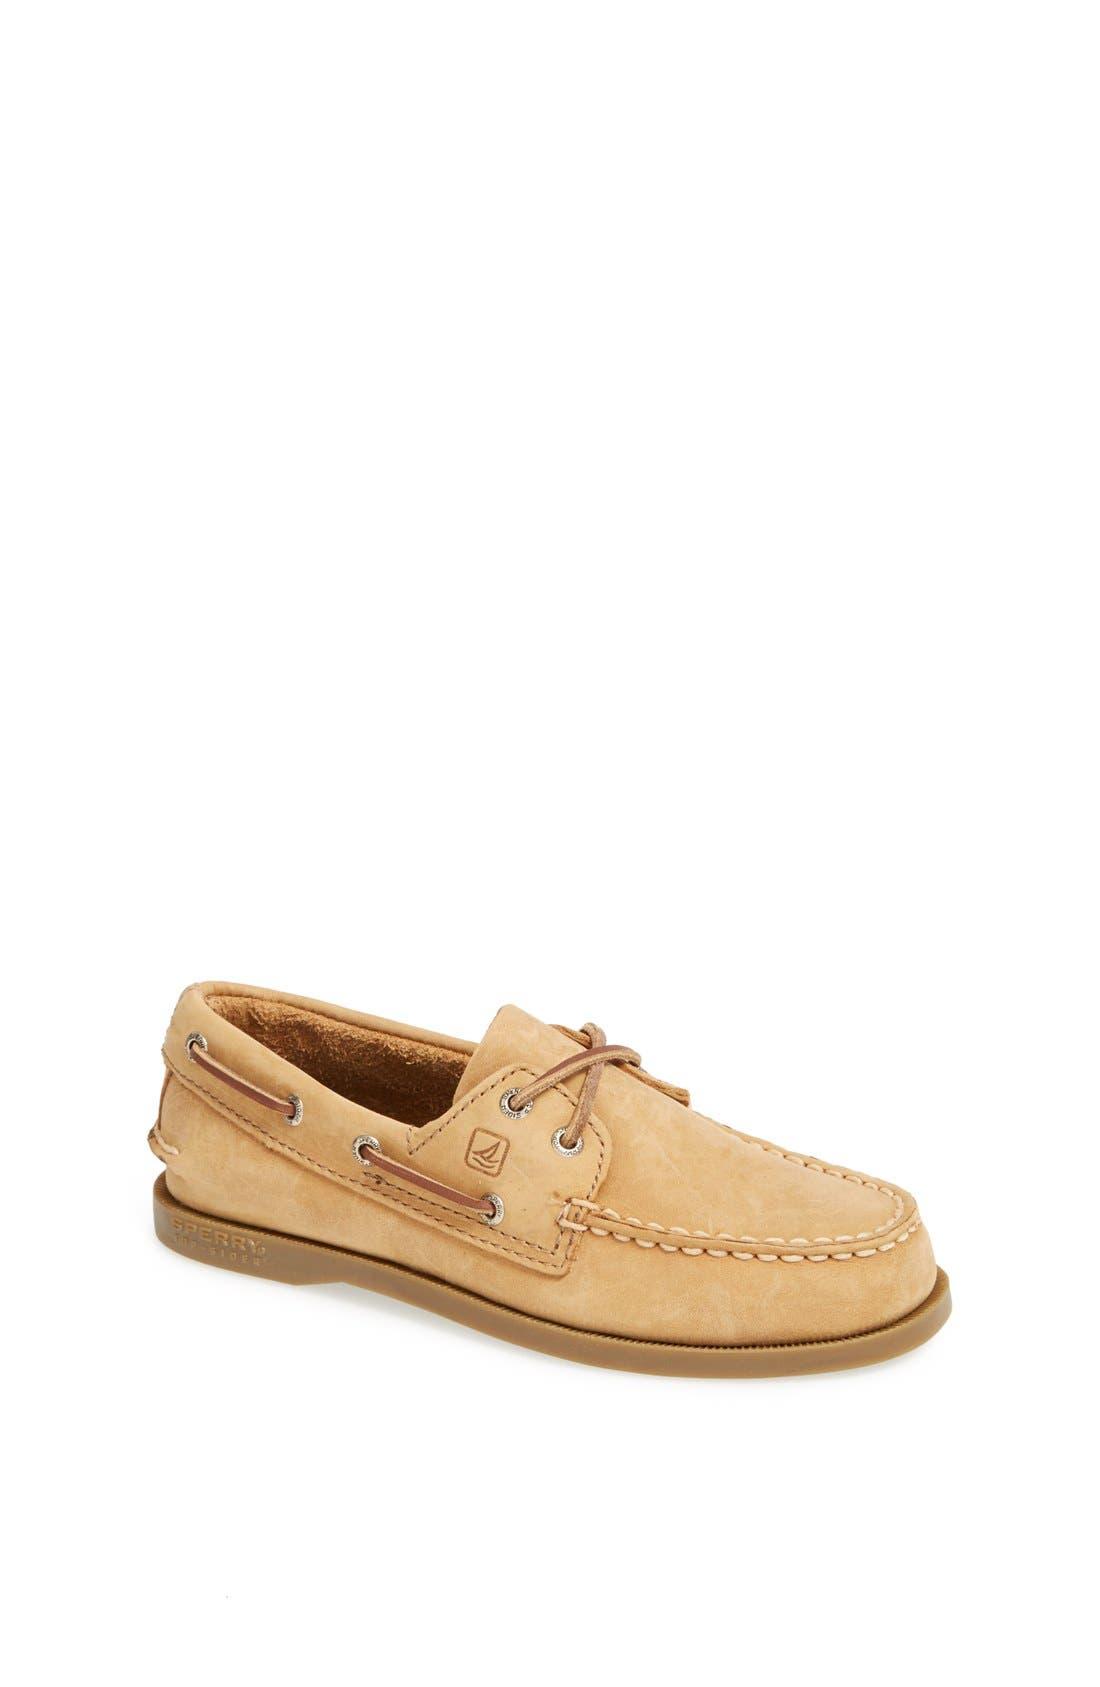 SPERRY KIDS 'Authentic Original' Boat Shoe, Main, color, SAHARA LEATHER